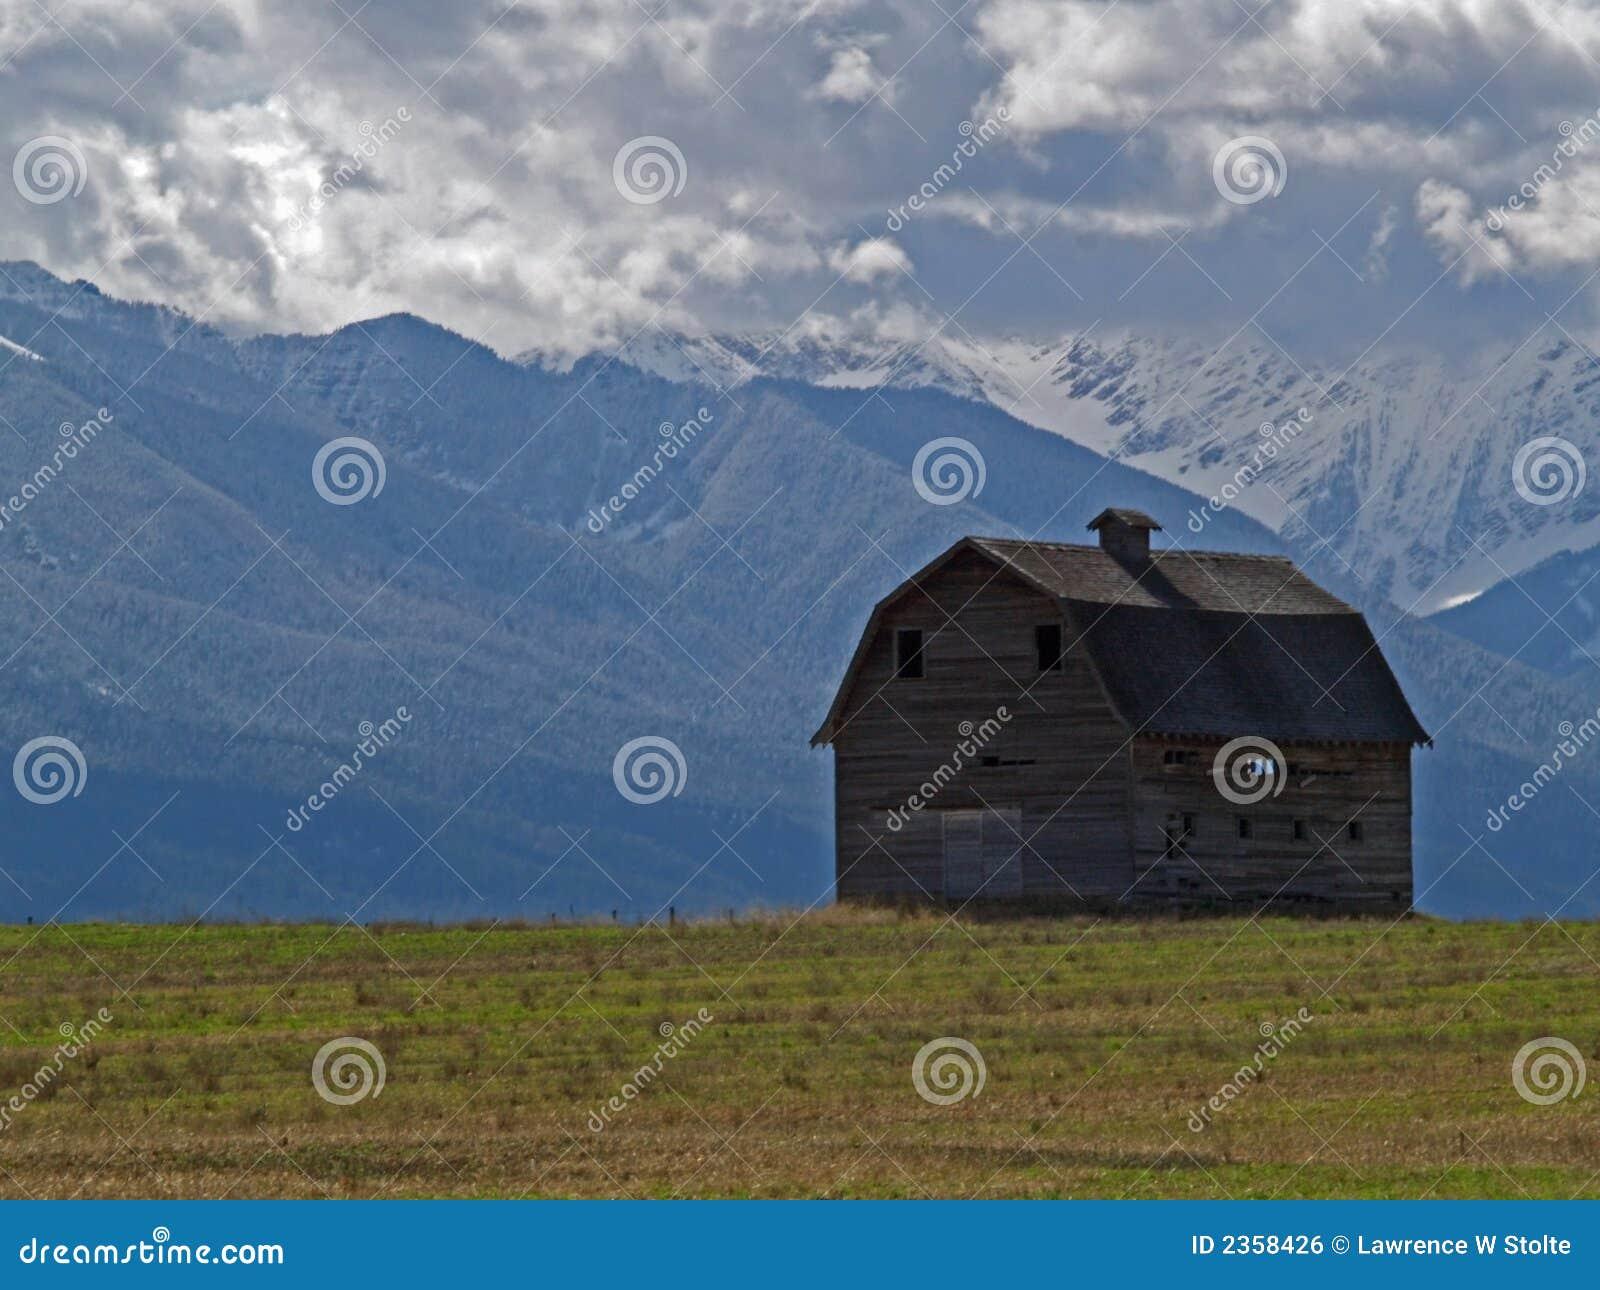 Barn and Mountains